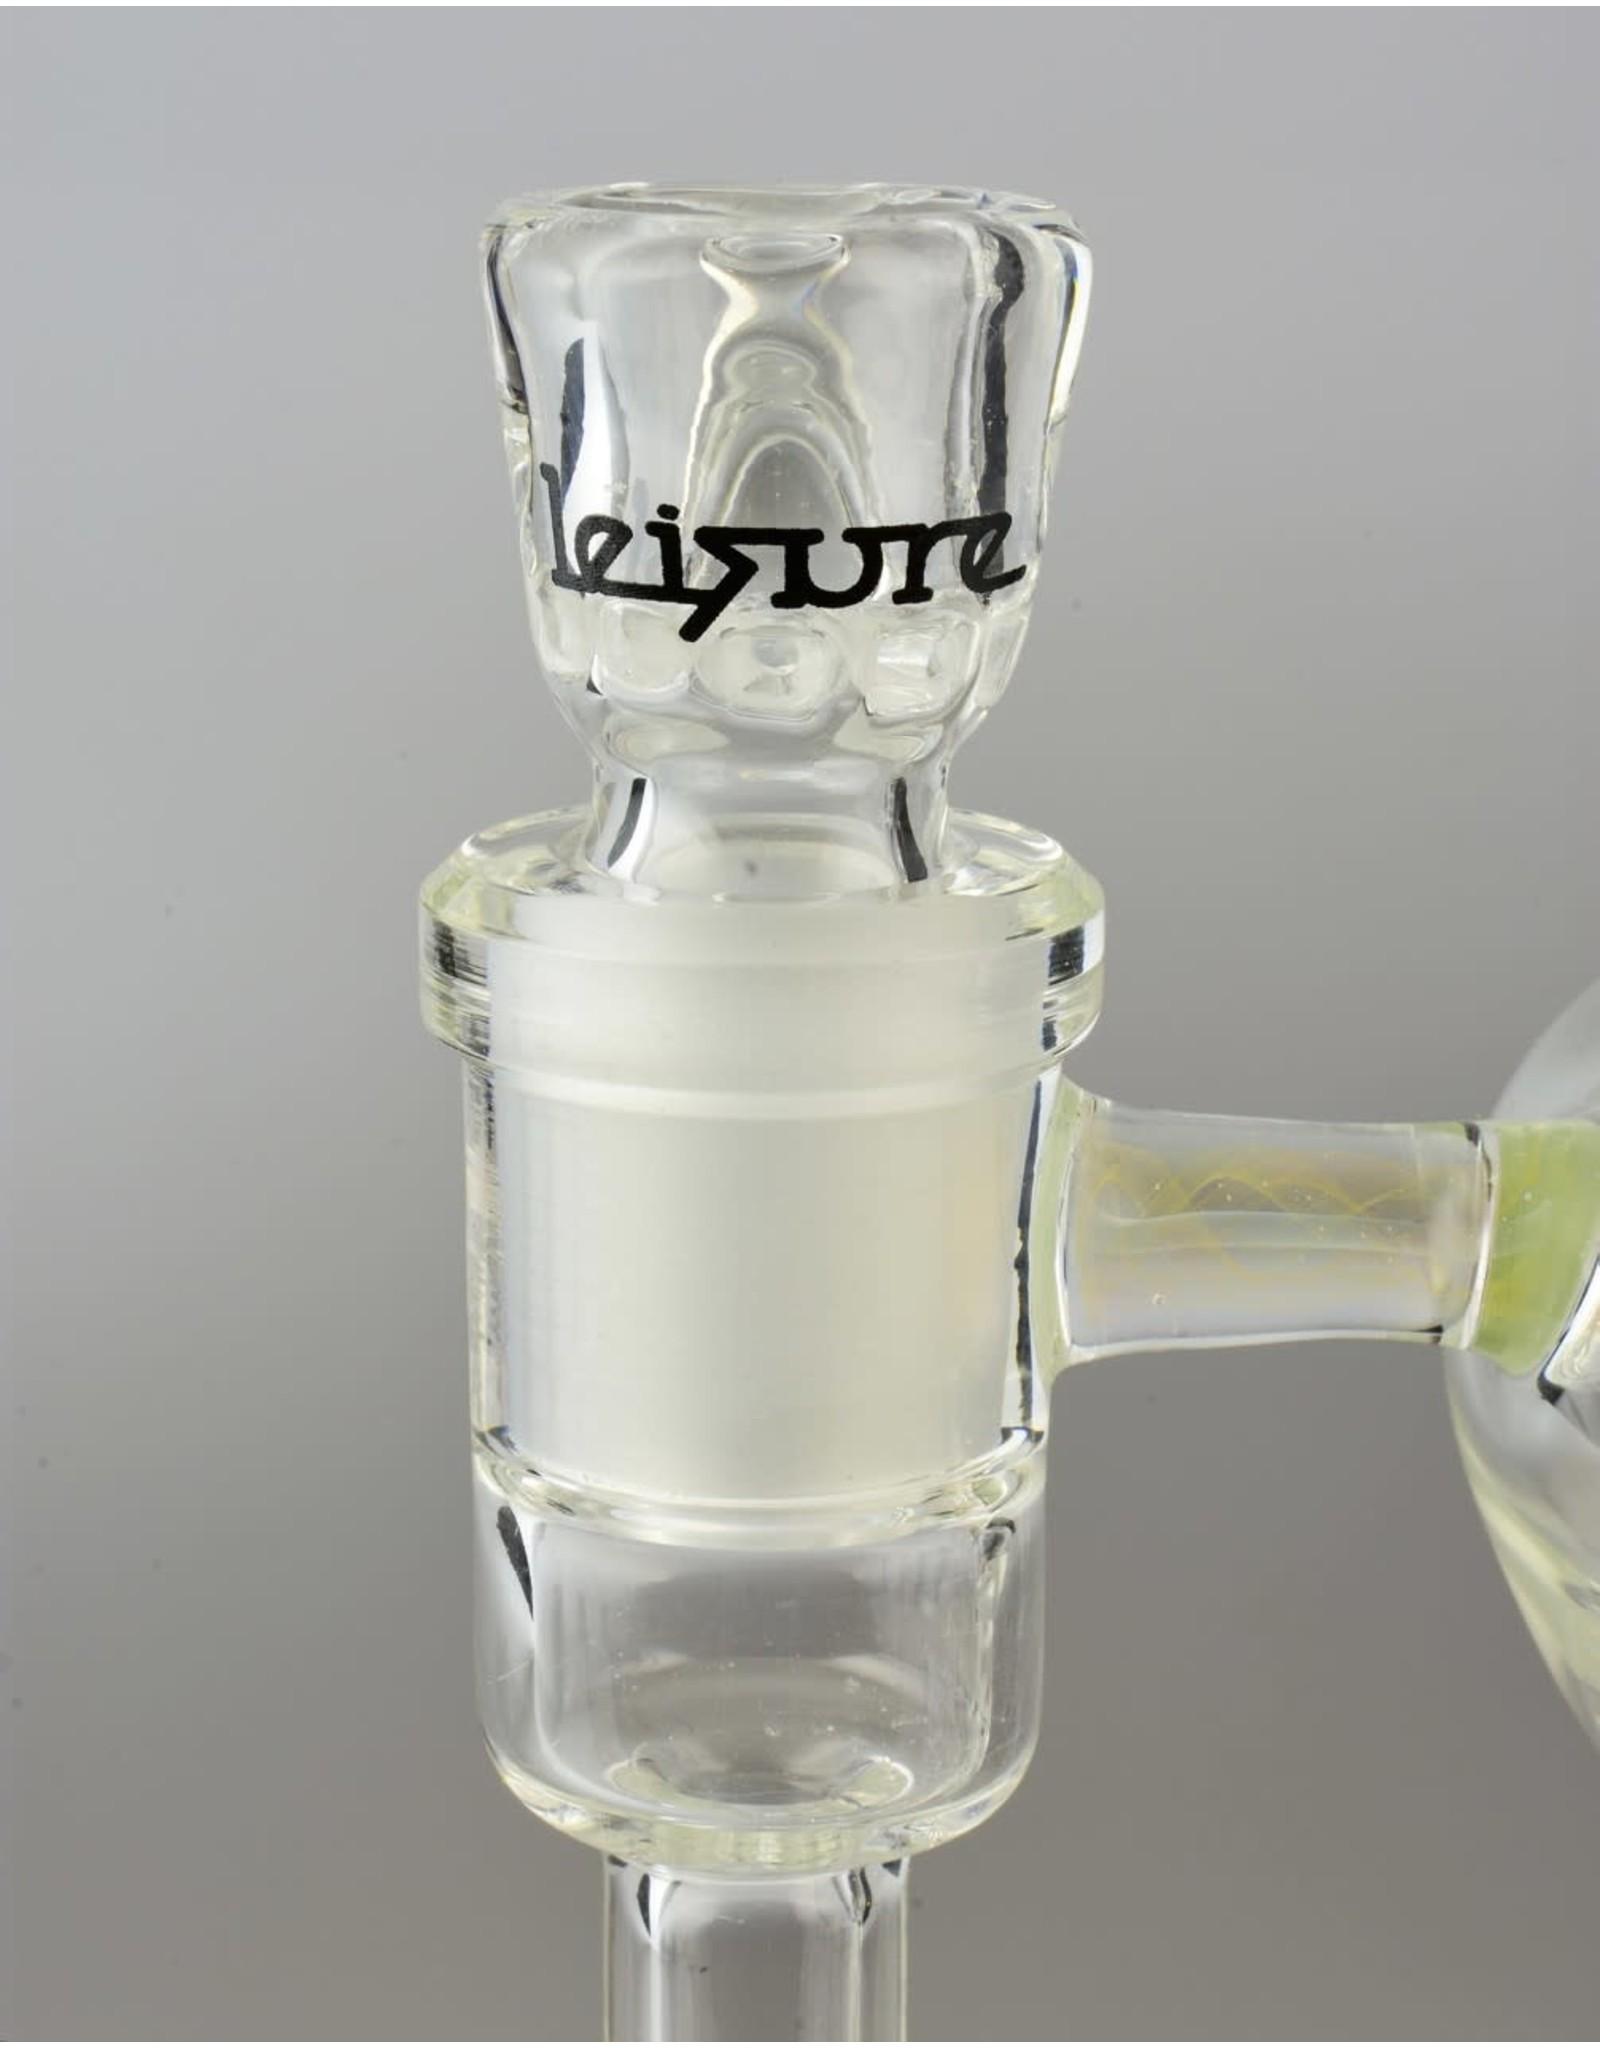 Leisure LTD glass Swiss Tree Incycler Rig